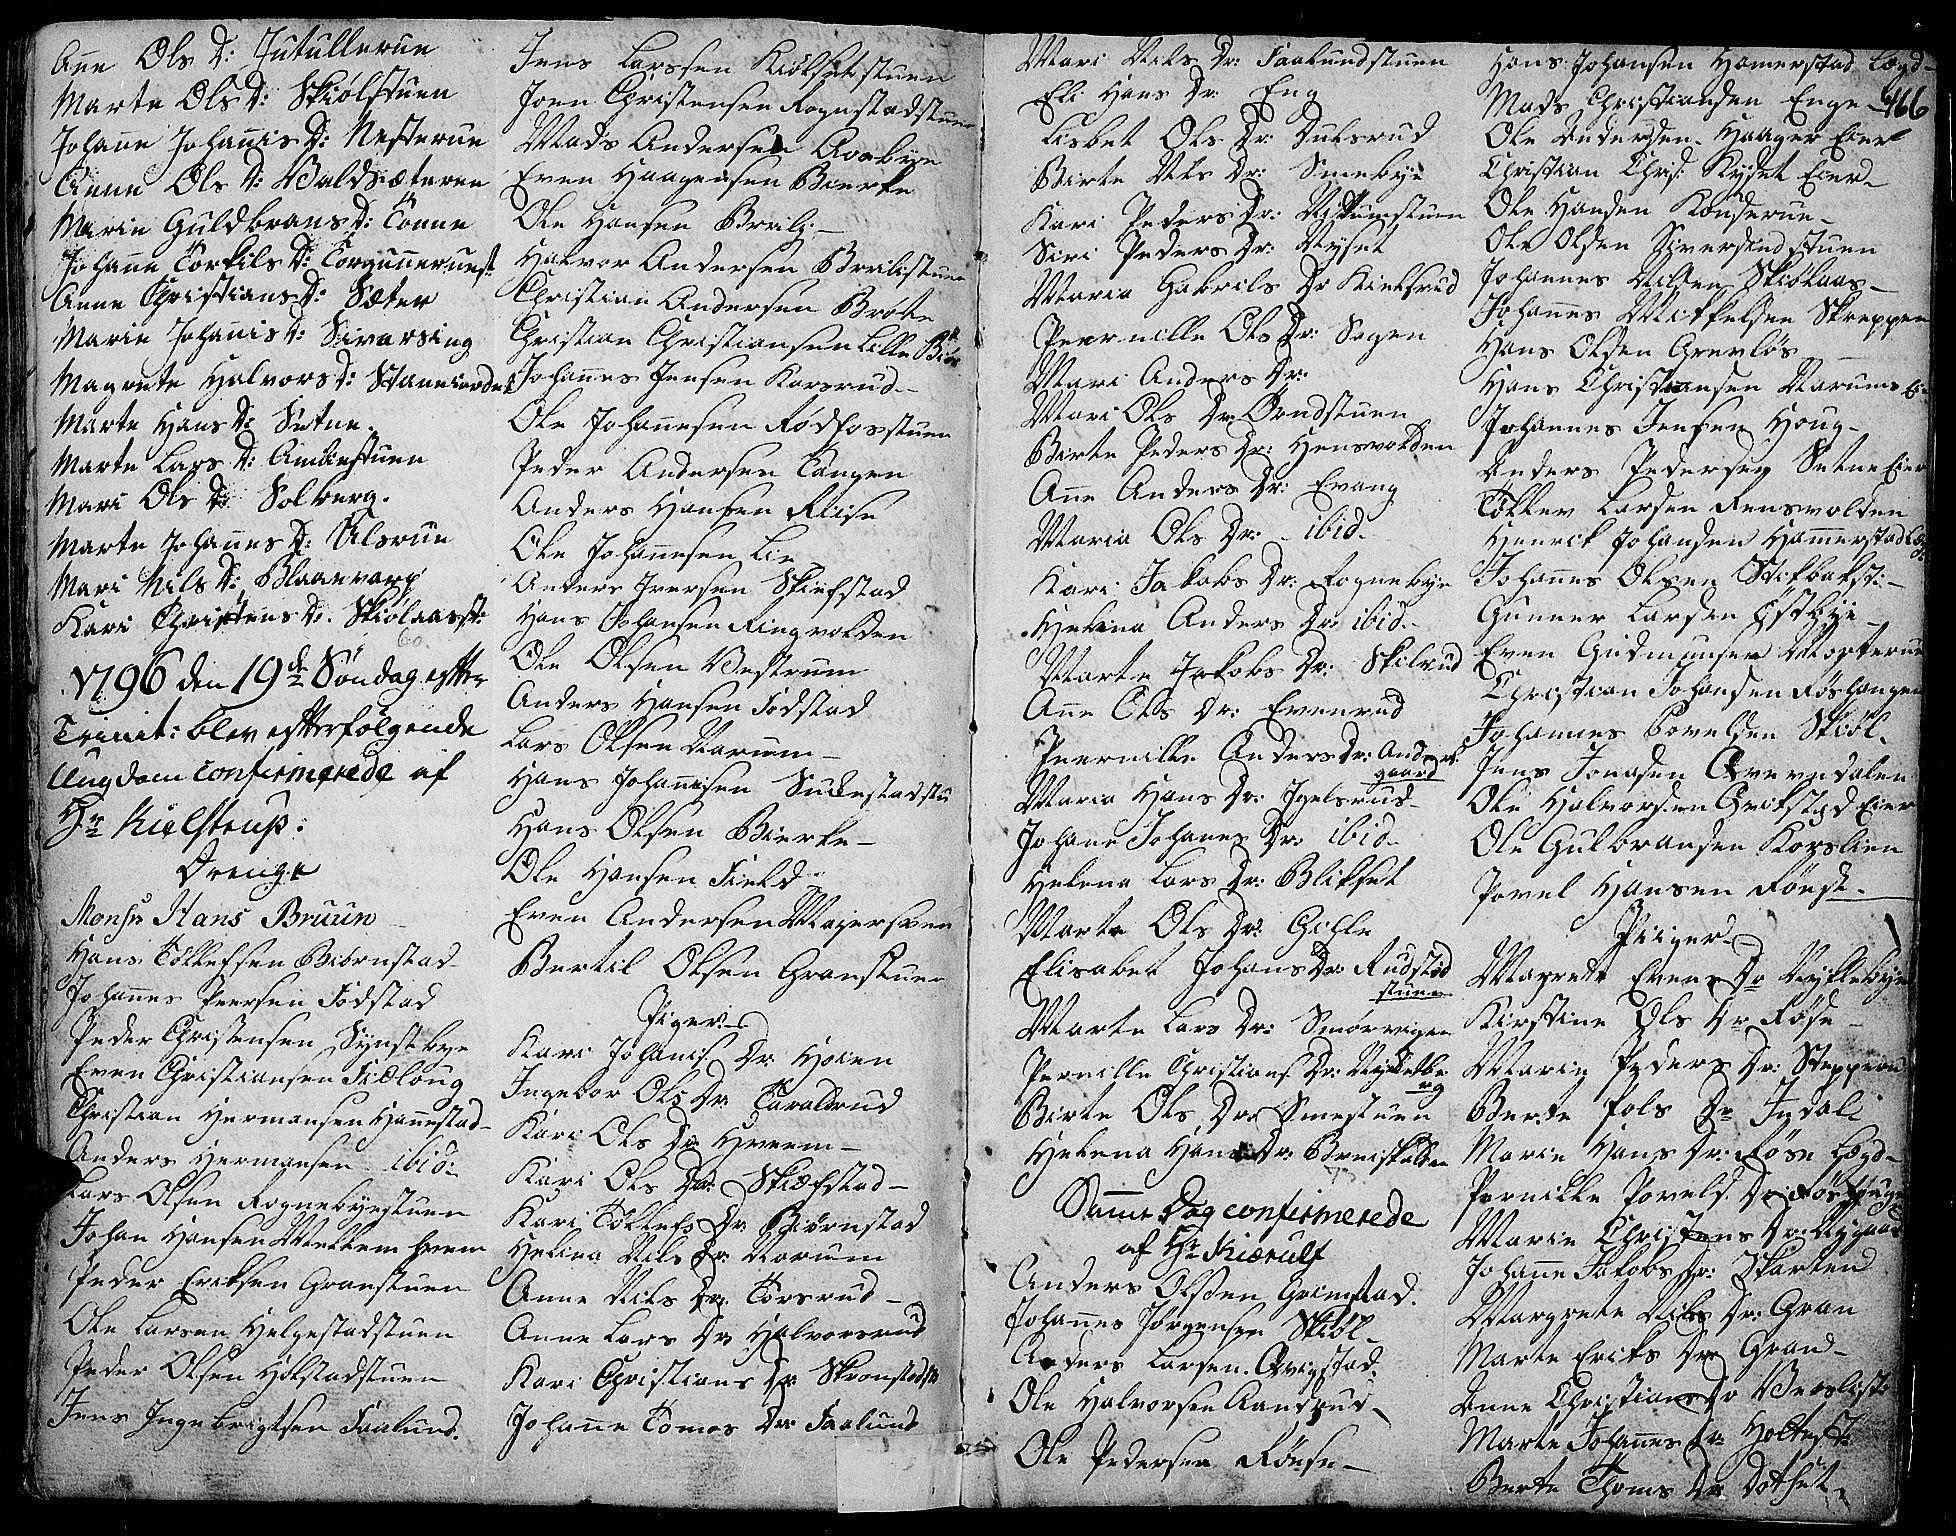 SAH, Toten prestekontor, Ministerialbok nr. 7, 1794-1809, s. 466